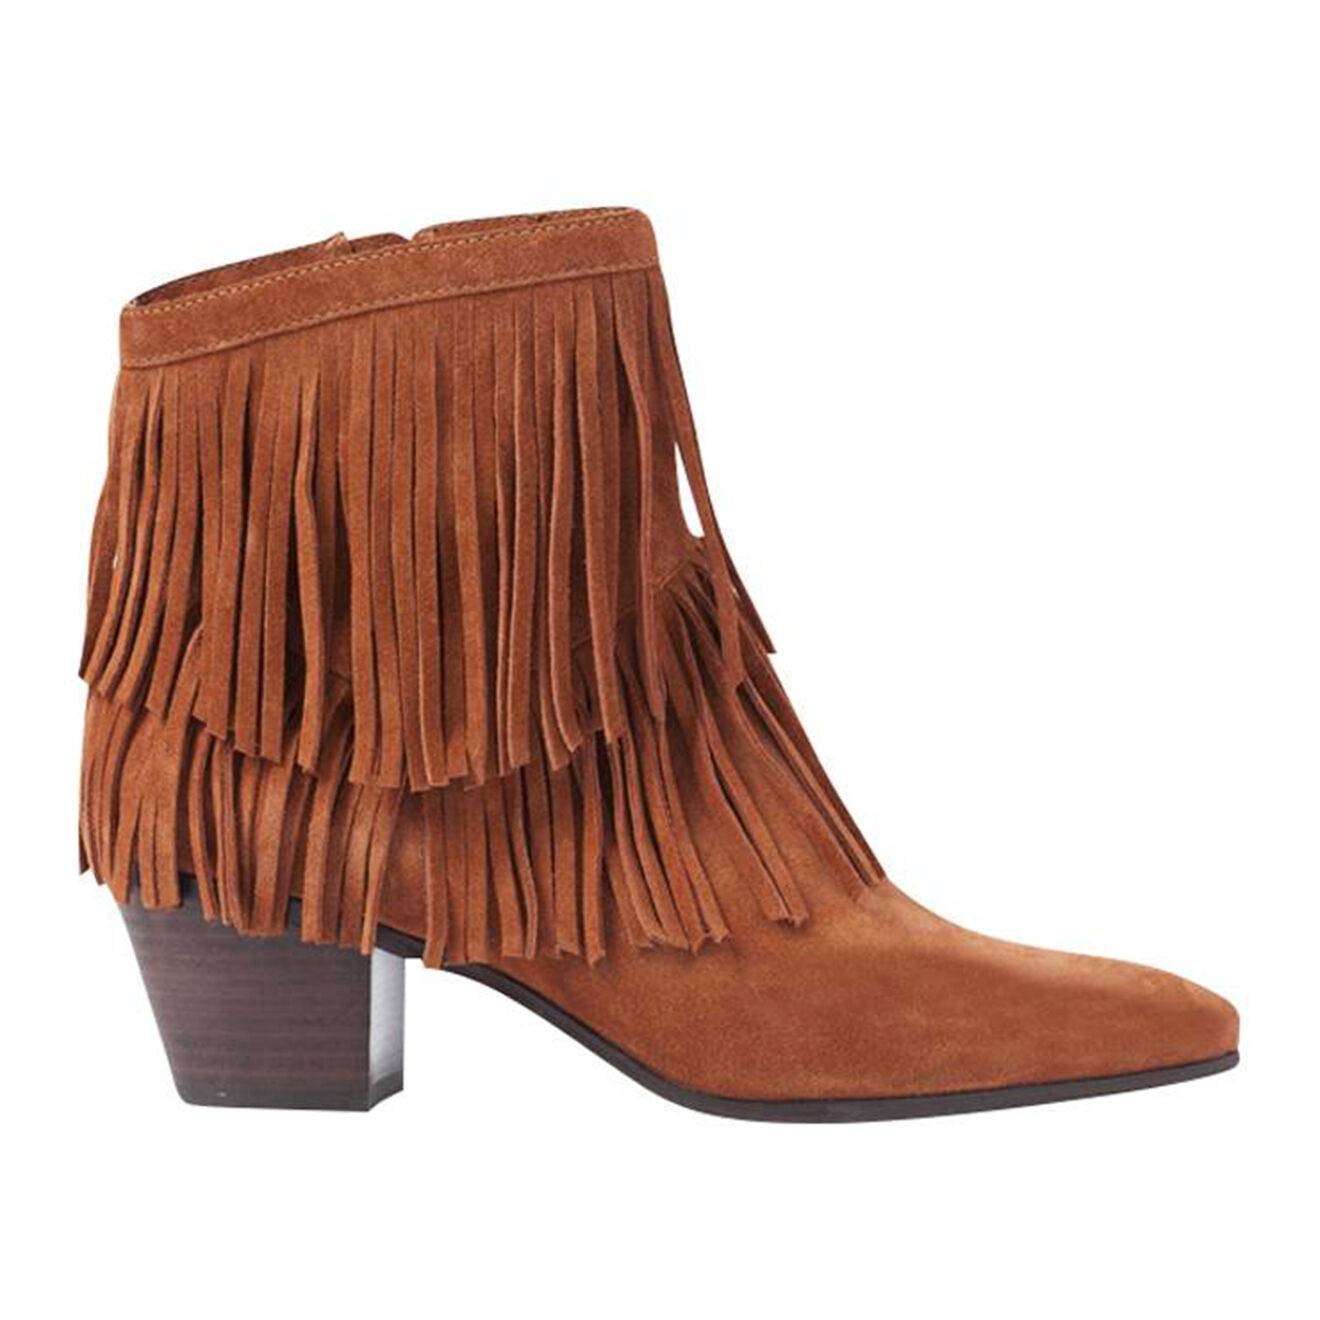 What For - Bottines en velours de Cuir western camel - Talon 5 cm